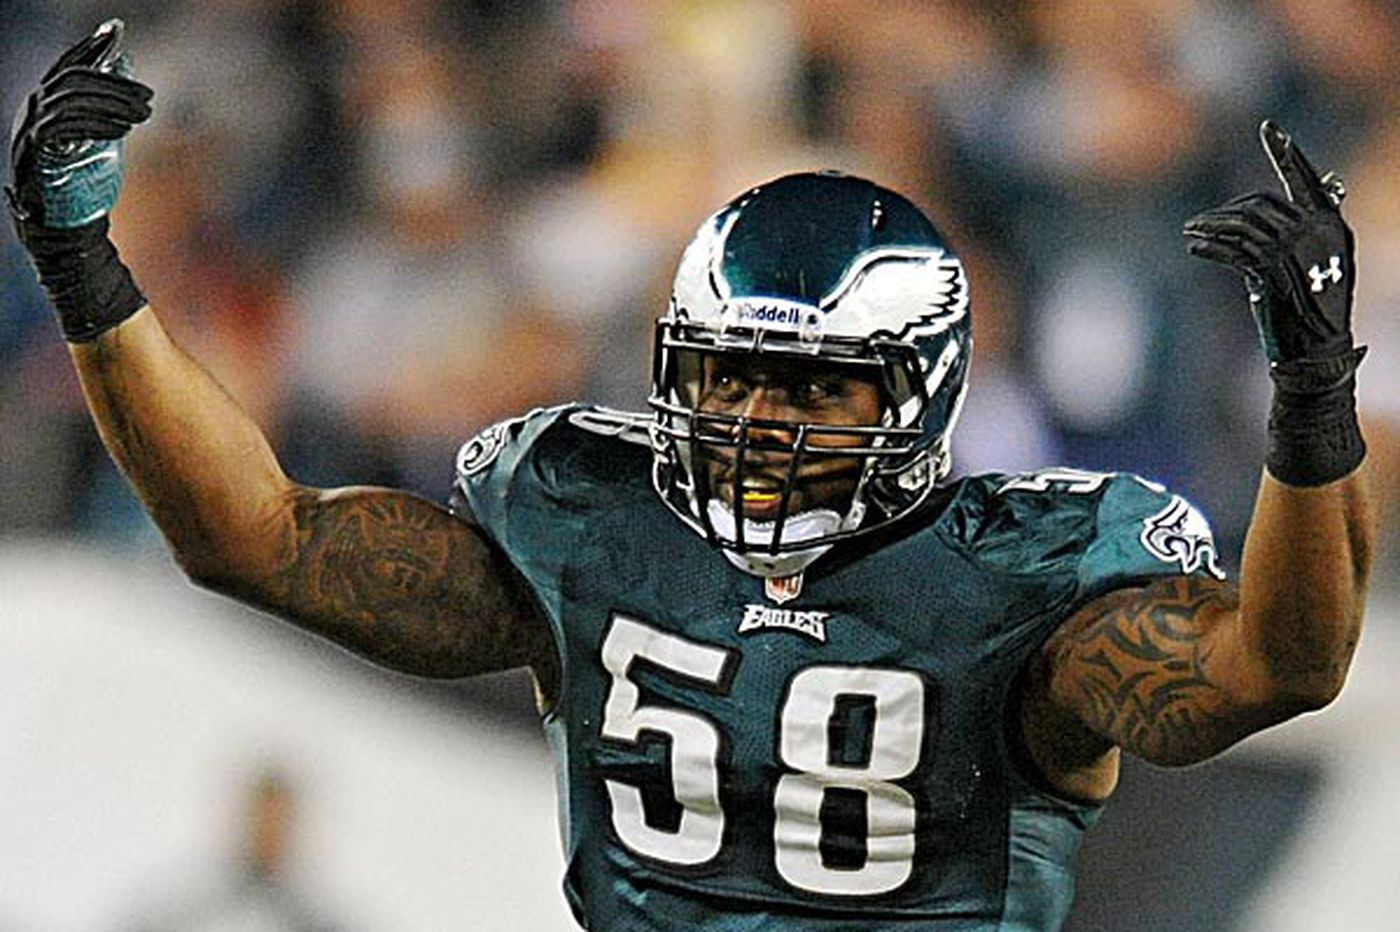 Eagles' defense getting sacks full of Cole